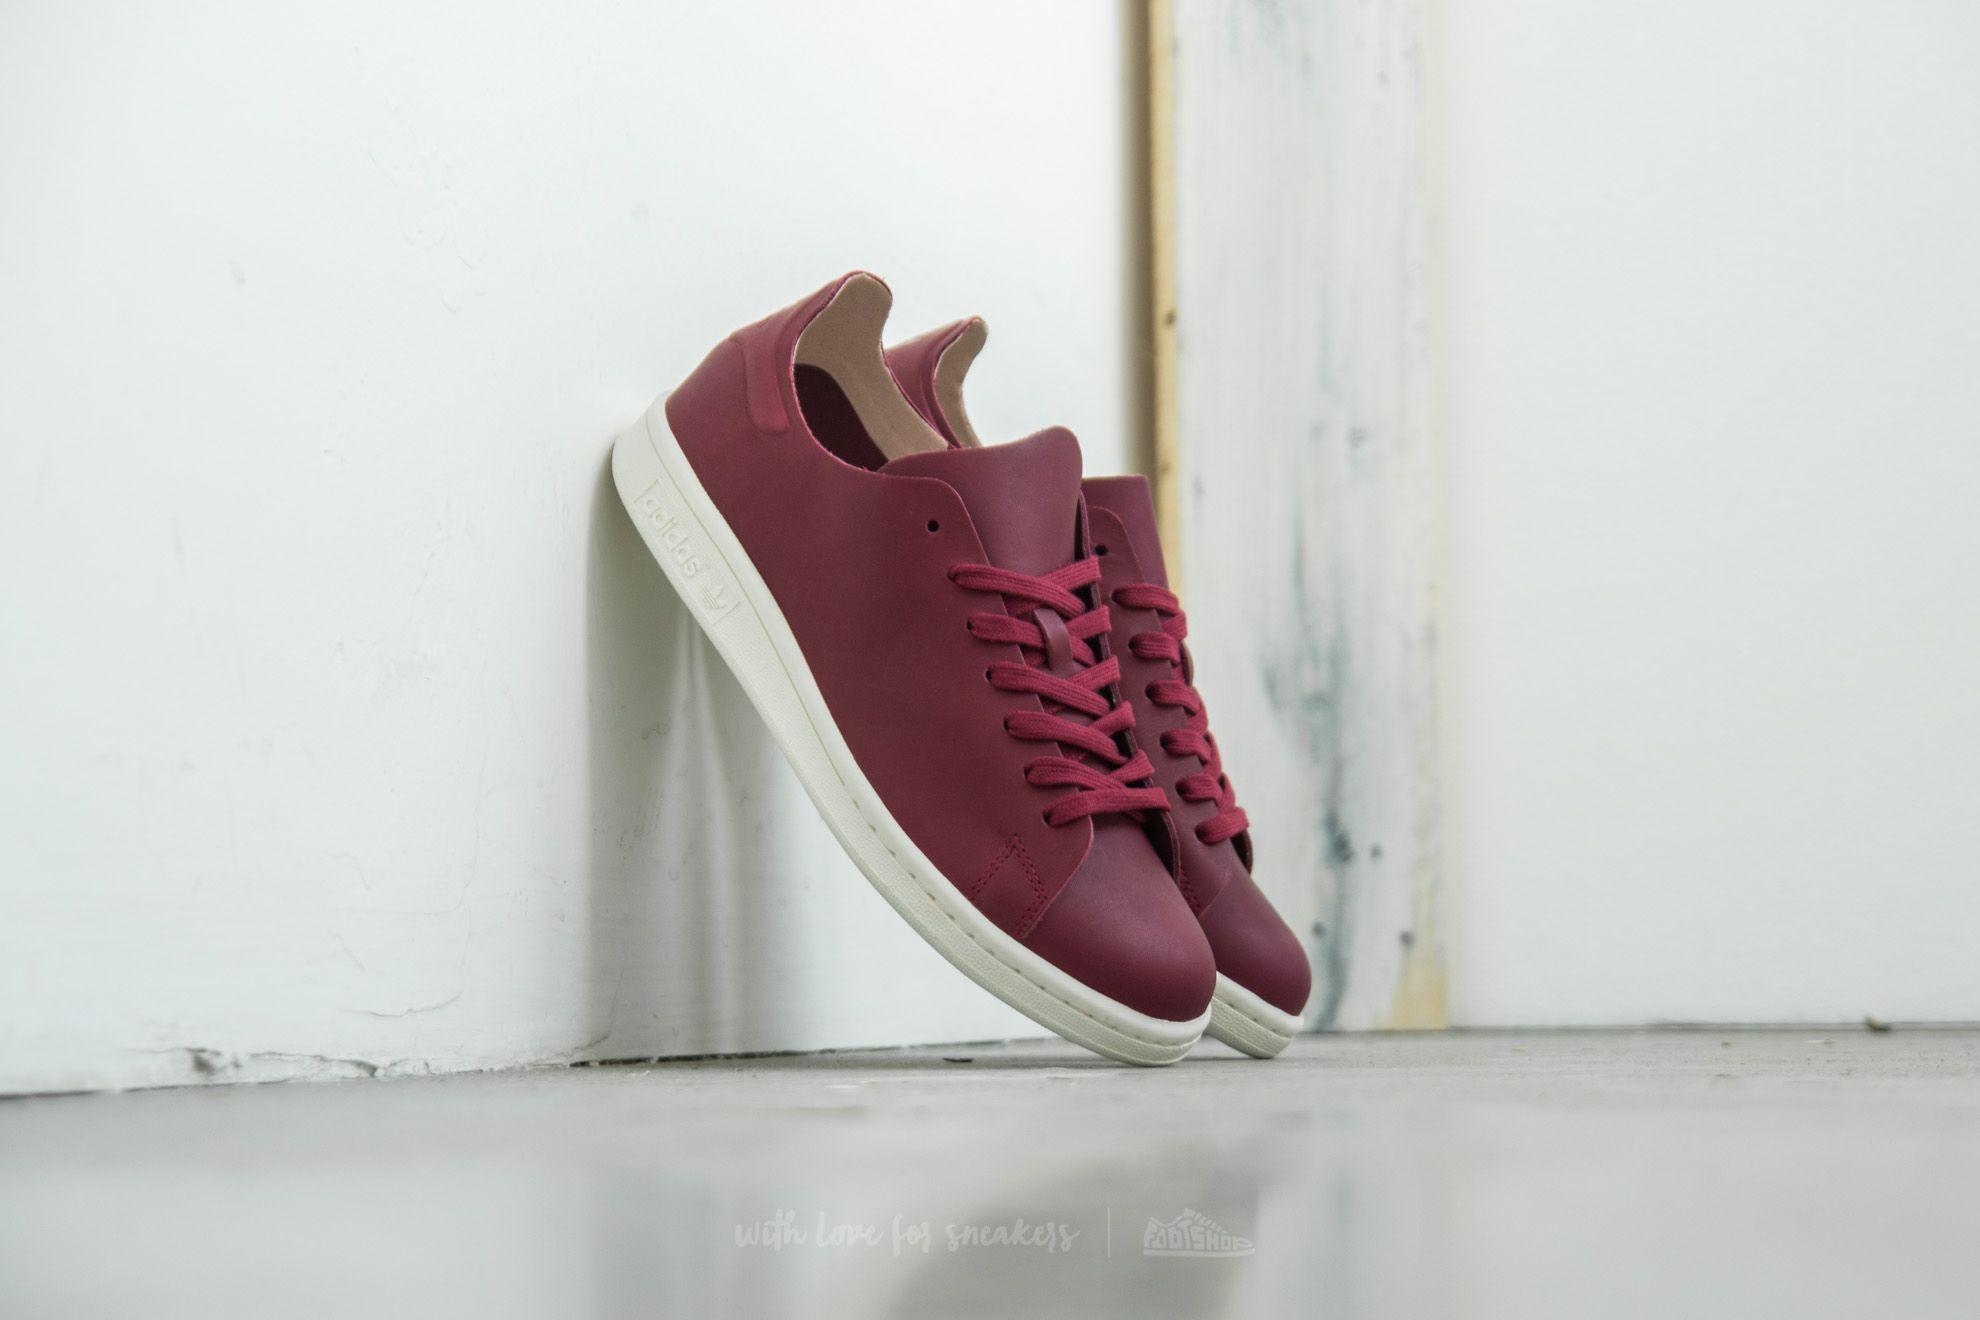 adidas Stan Smith Nuude W Collegiate Burgundy  1cfd0196f